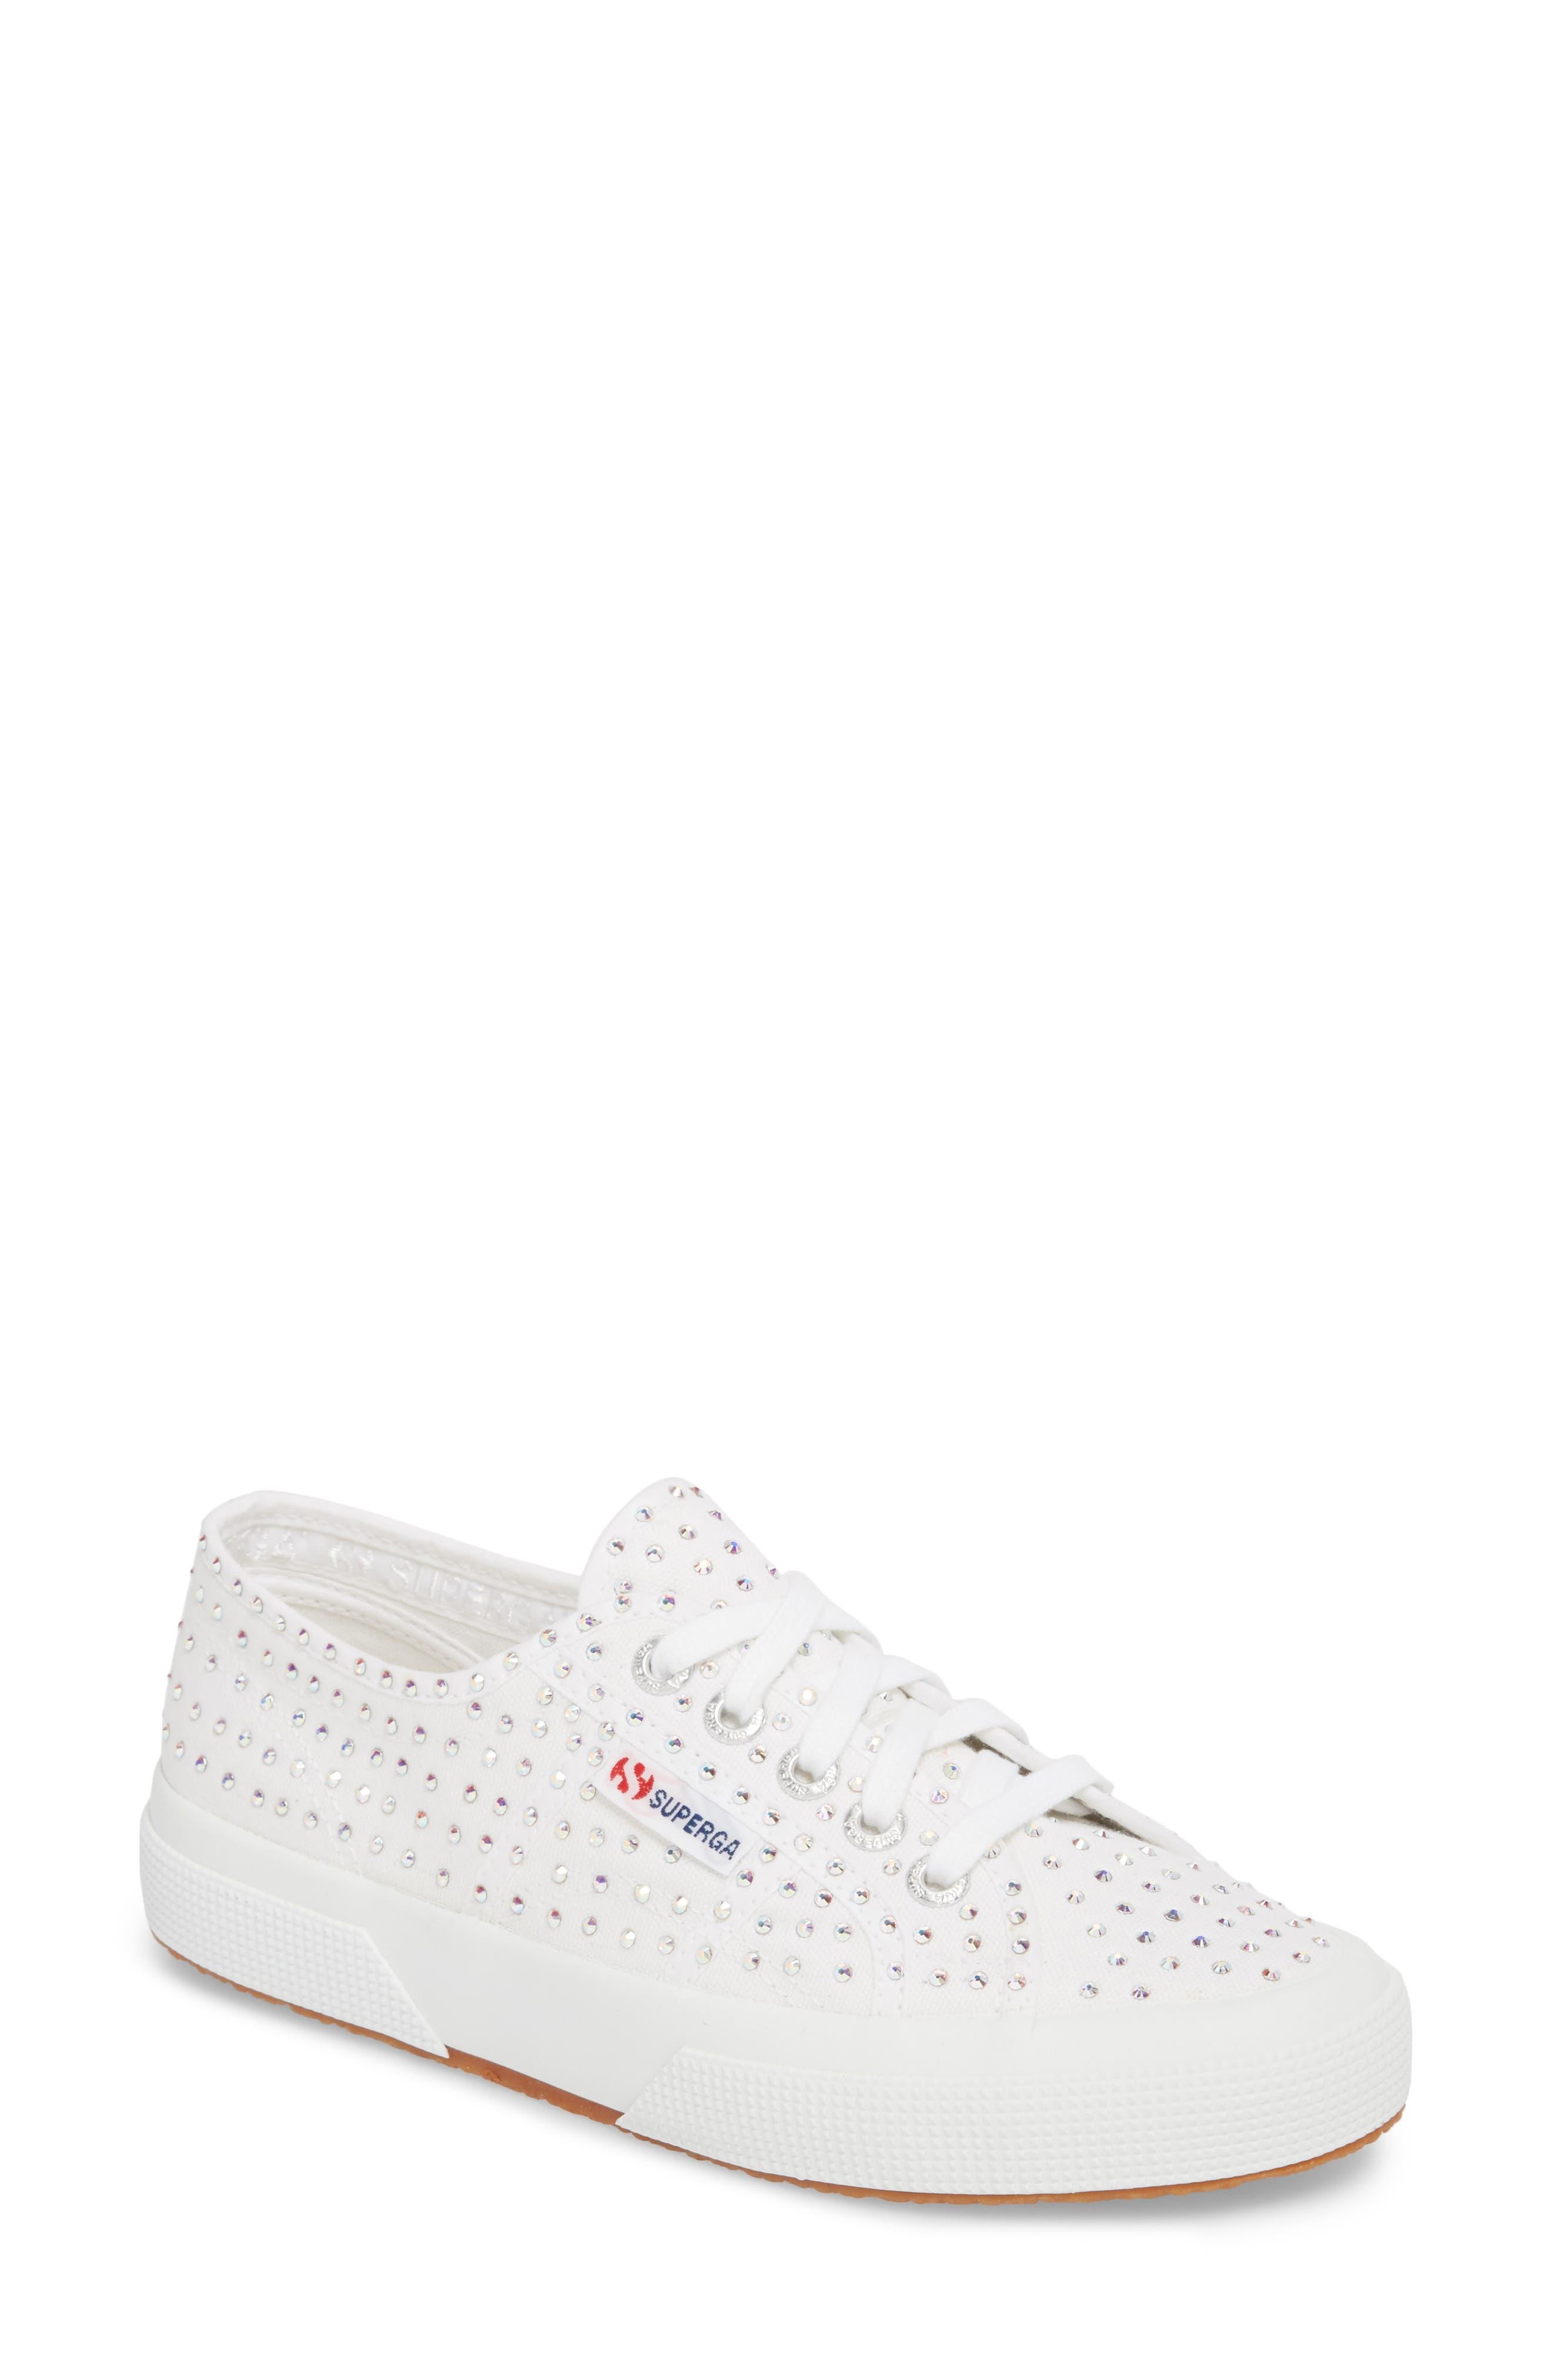 2750 Crystal Sneaker,                         Main,                         color, White Multi